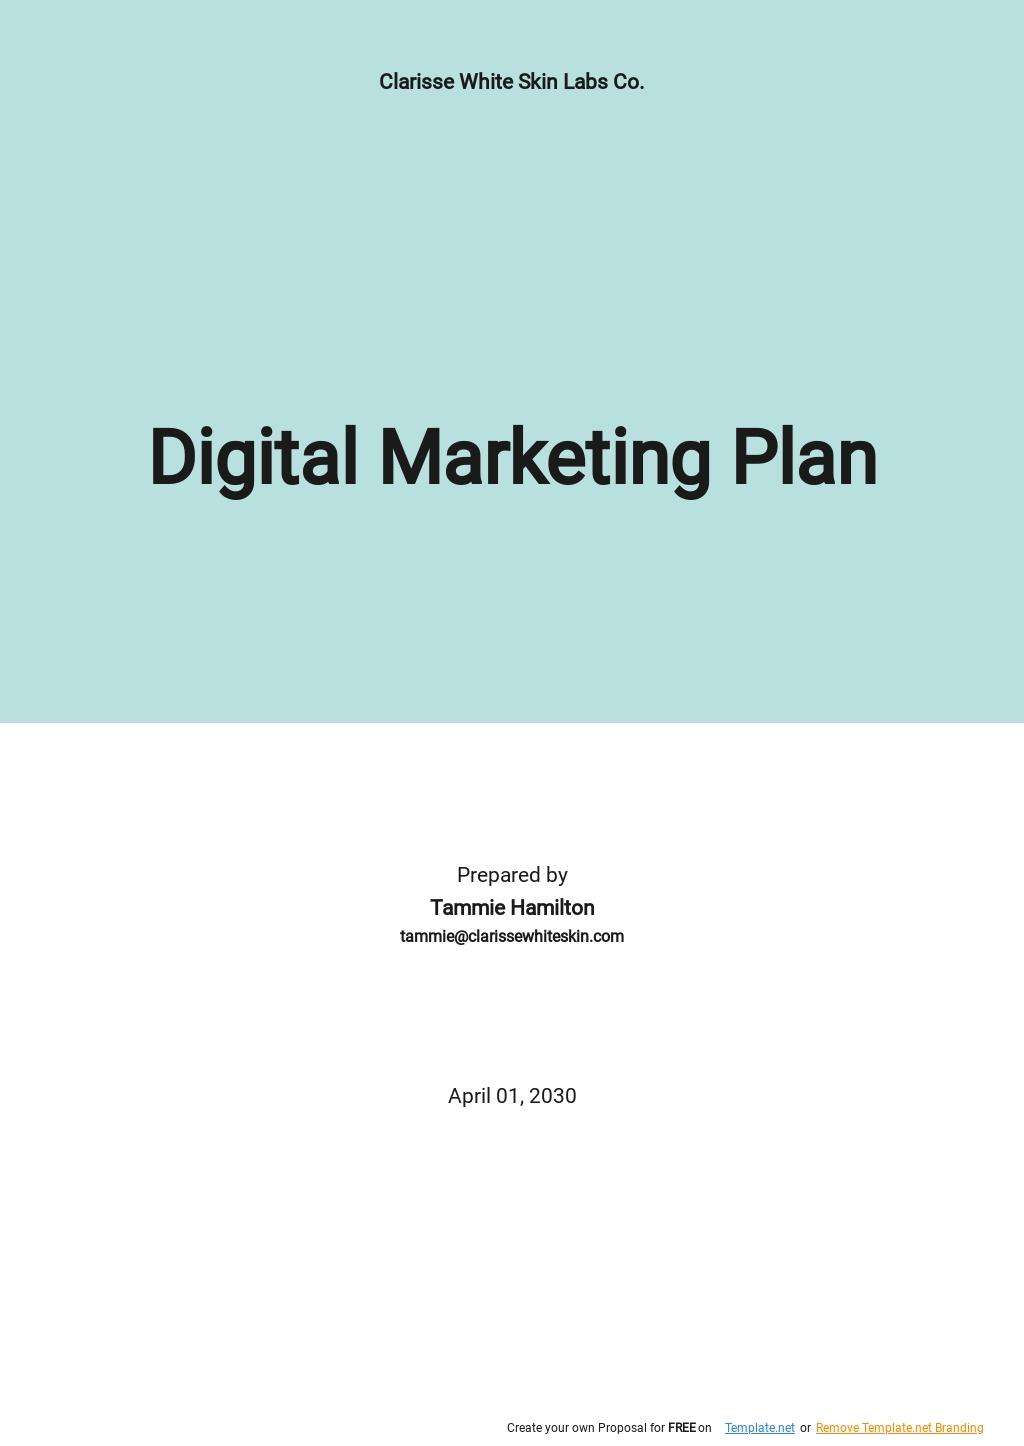 Digital Marketing Plan Template.jpe